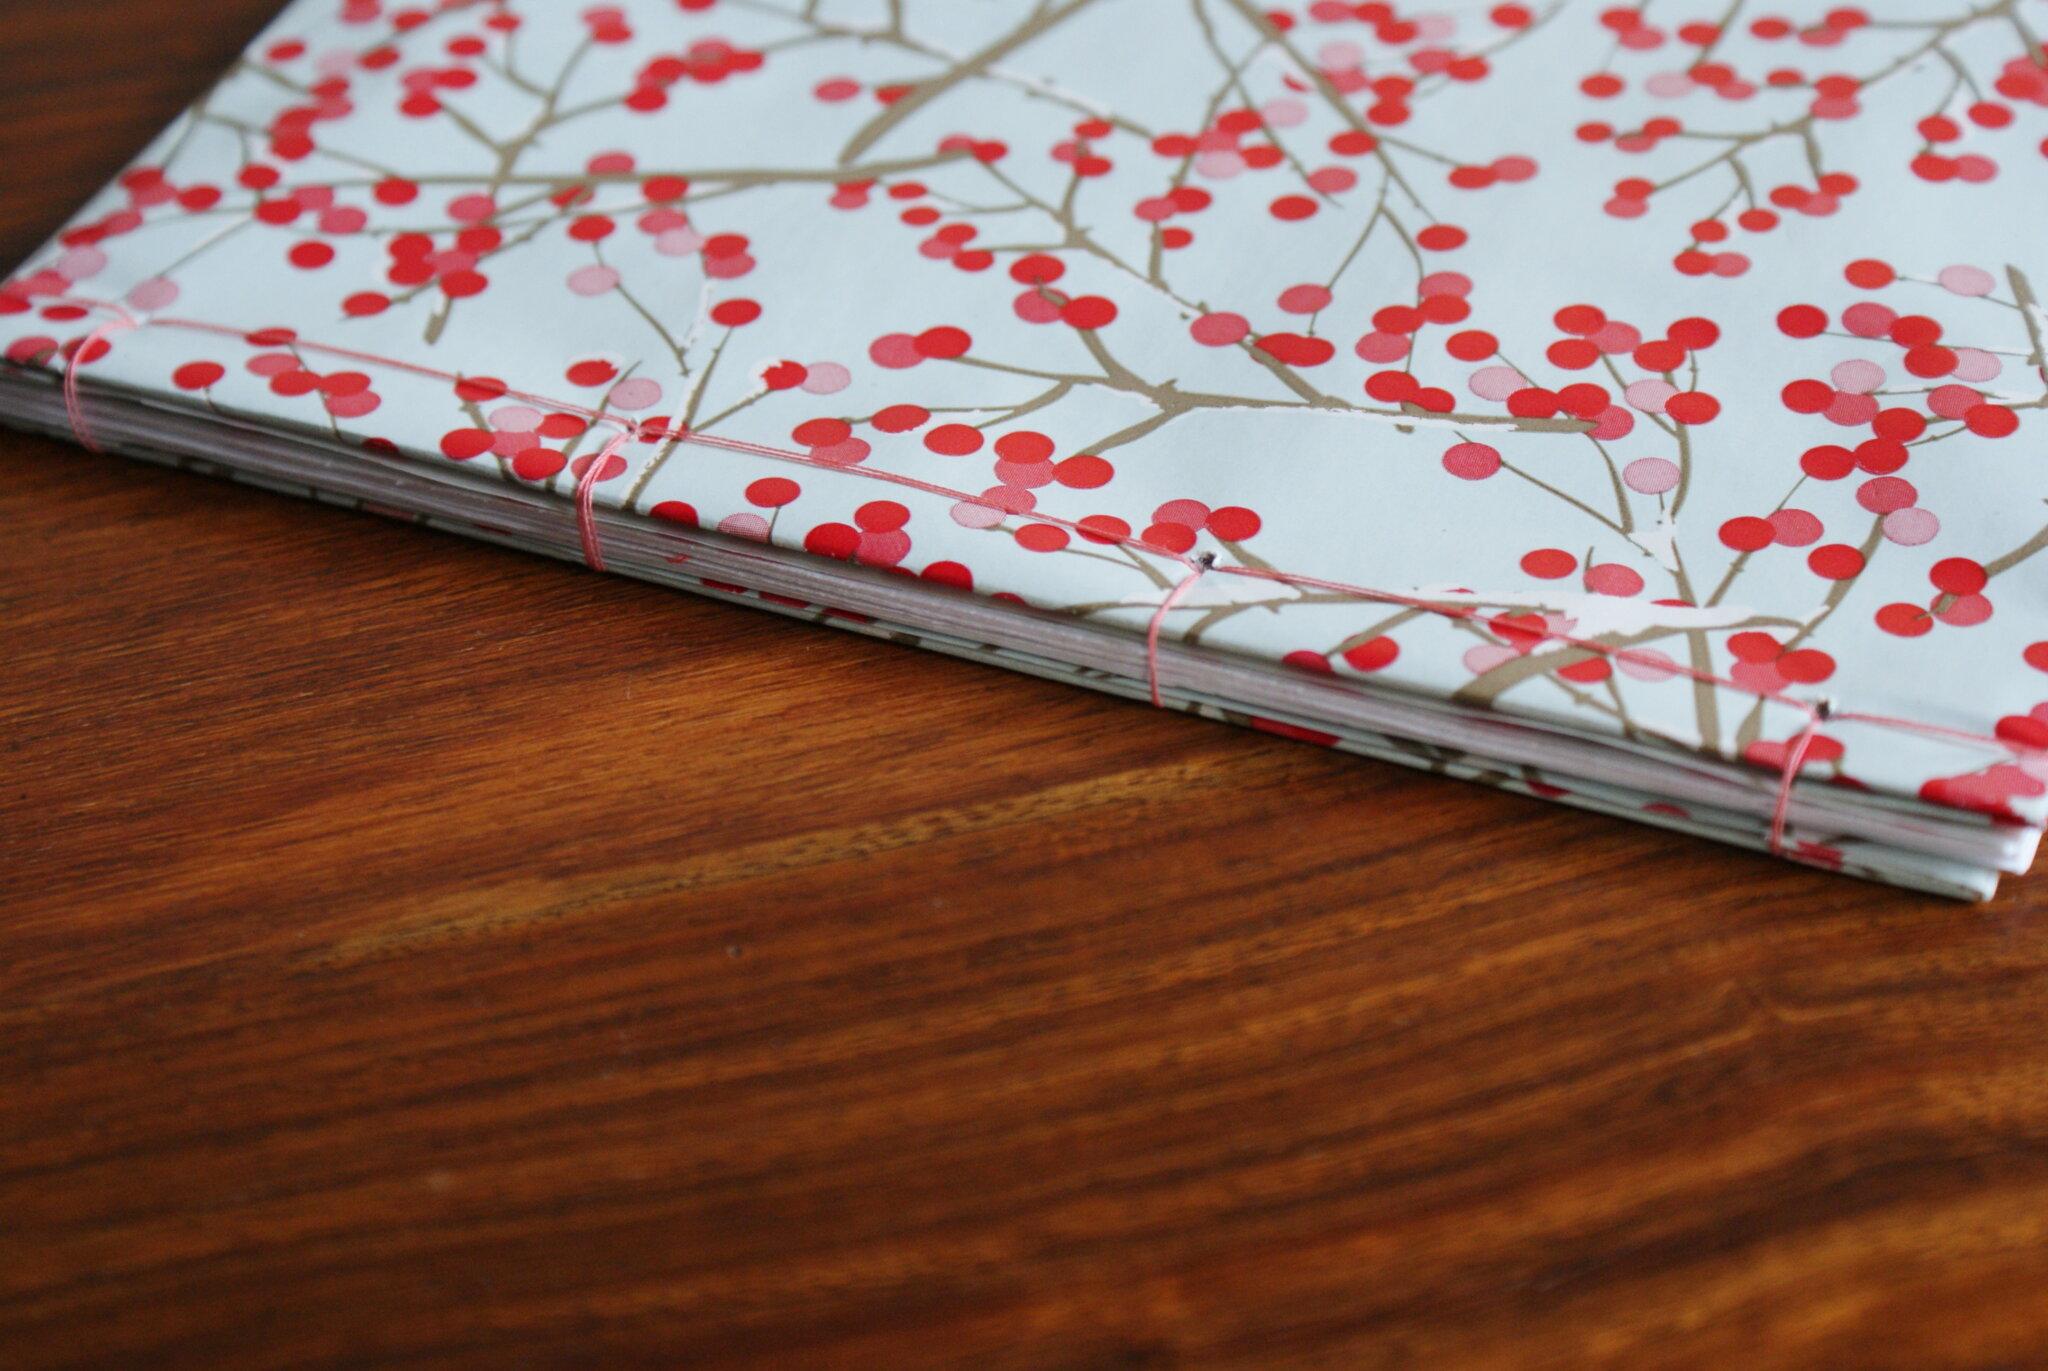 watoji fai da te diy tutorial rilegatura giapponese quaderno libro carta